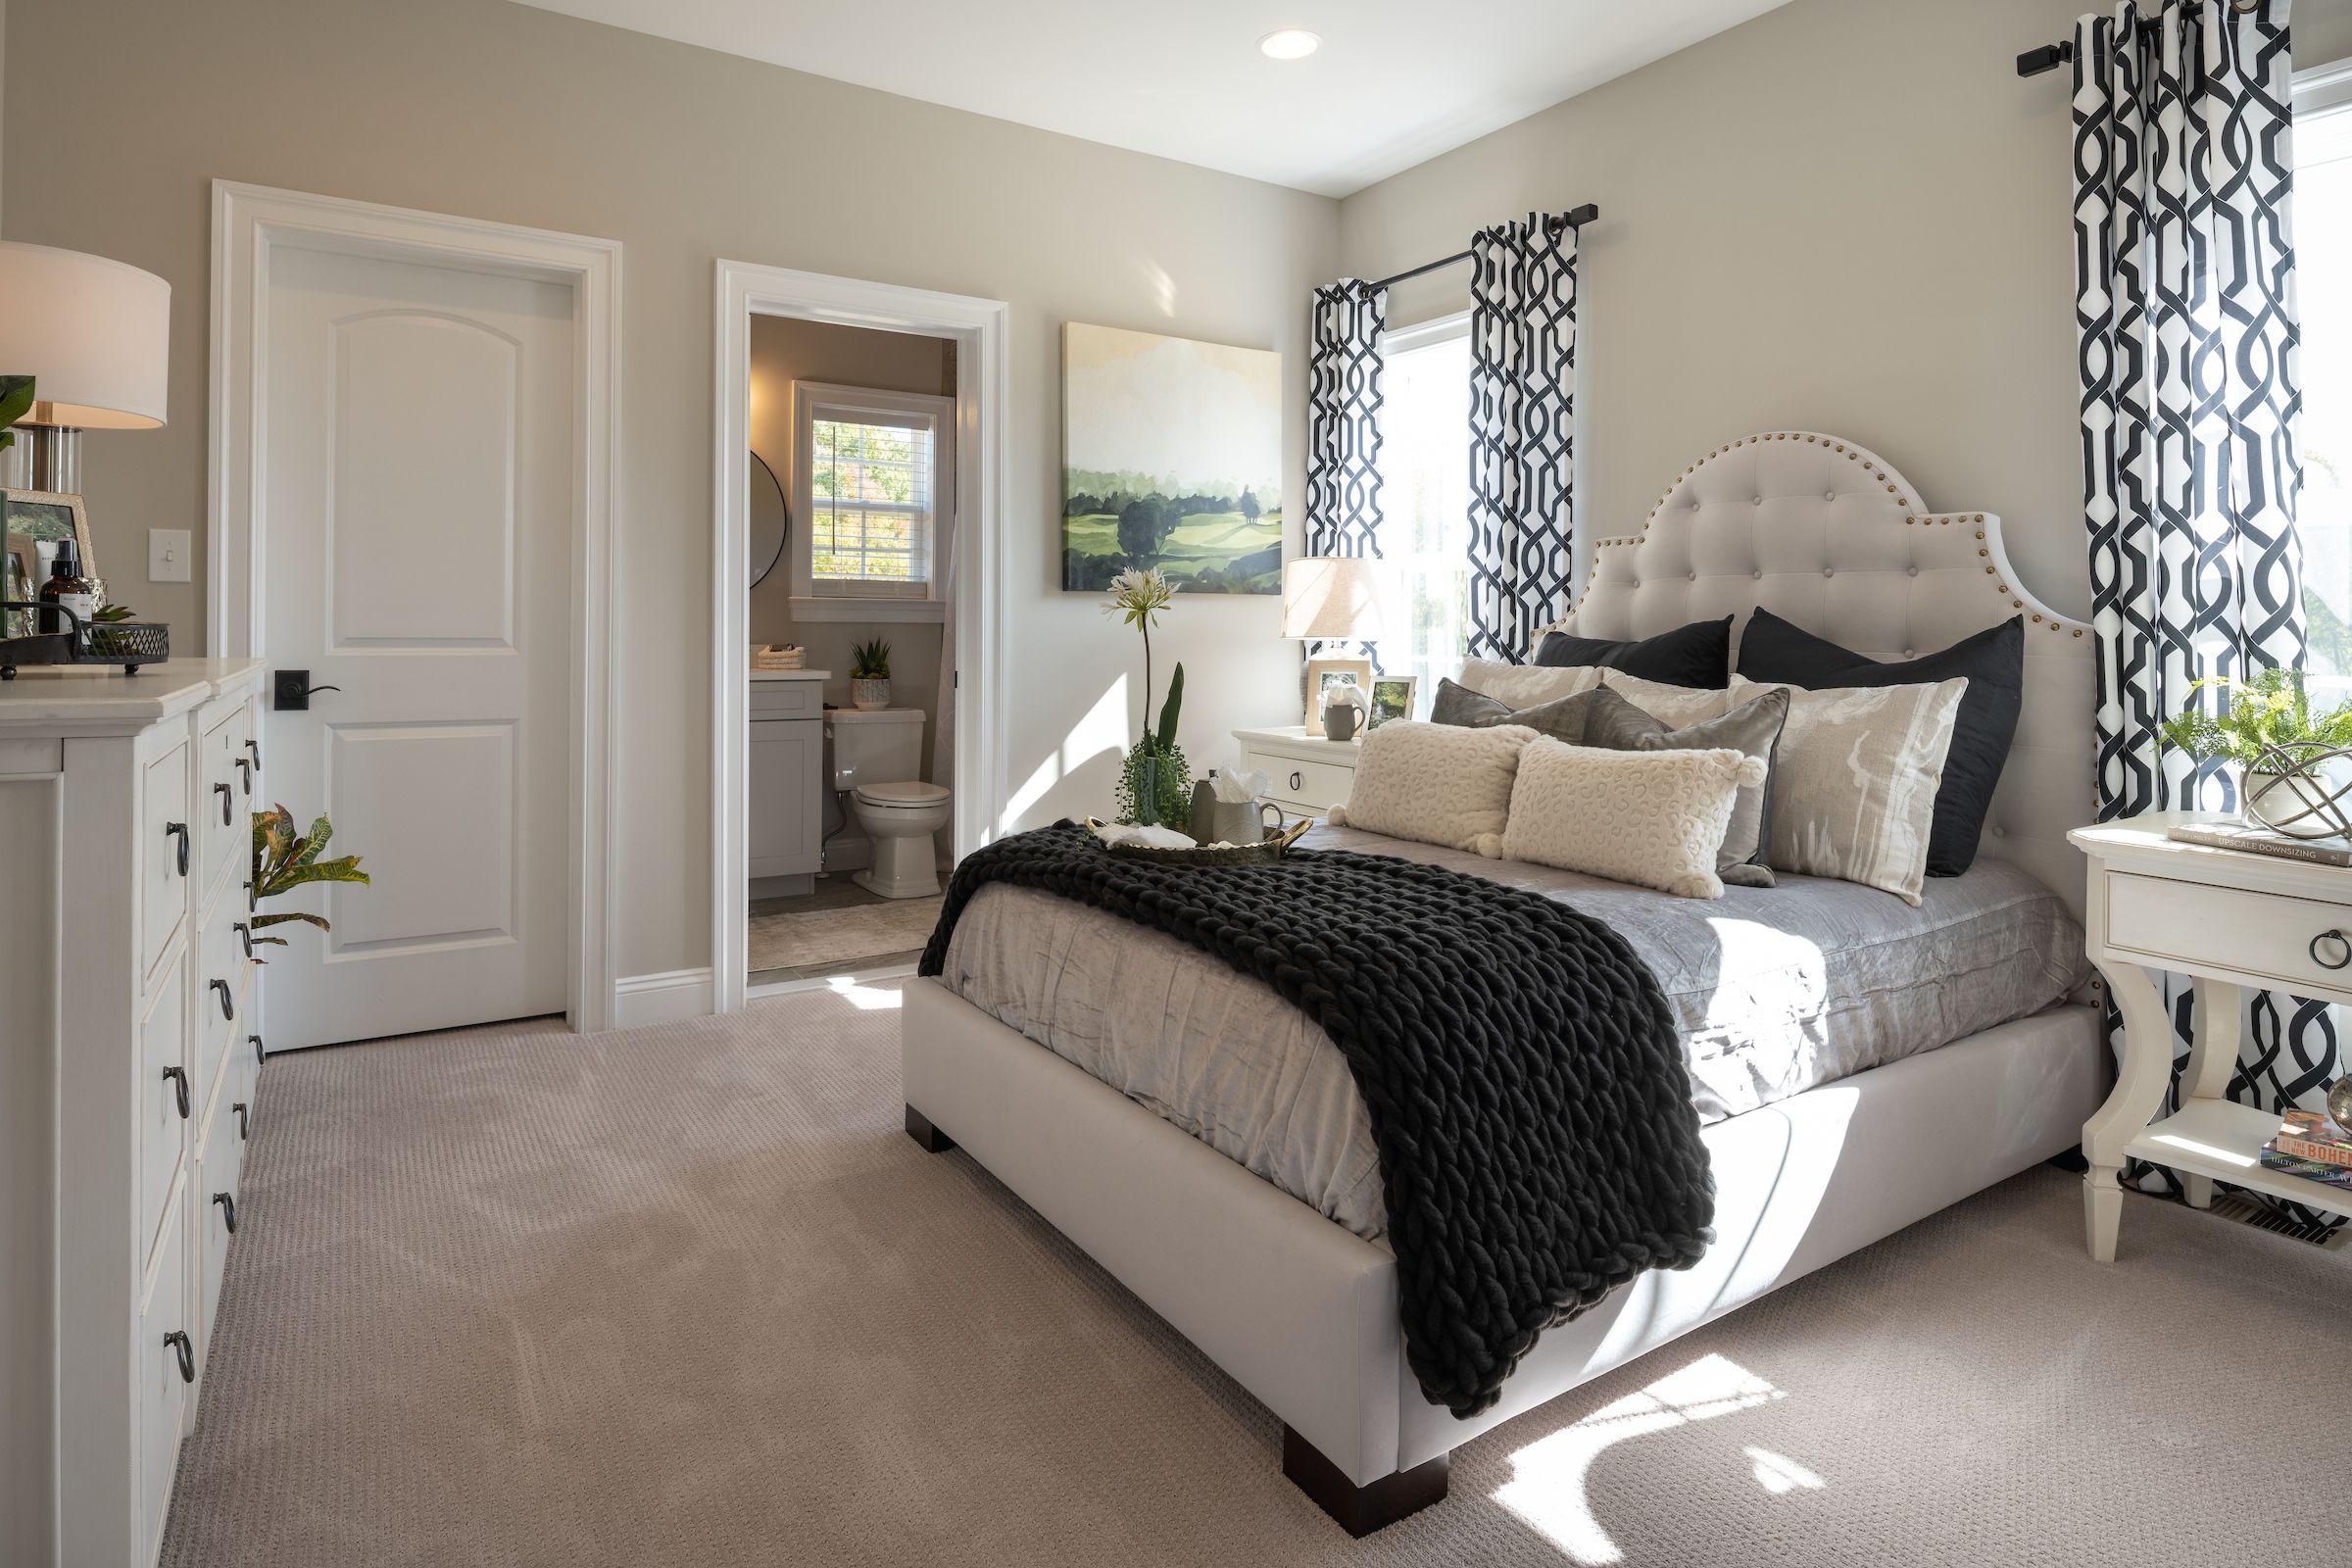 Bedroom featured in the Hawthorne Manor By Keystone Custom Homes in Wilmington-Newark, MD